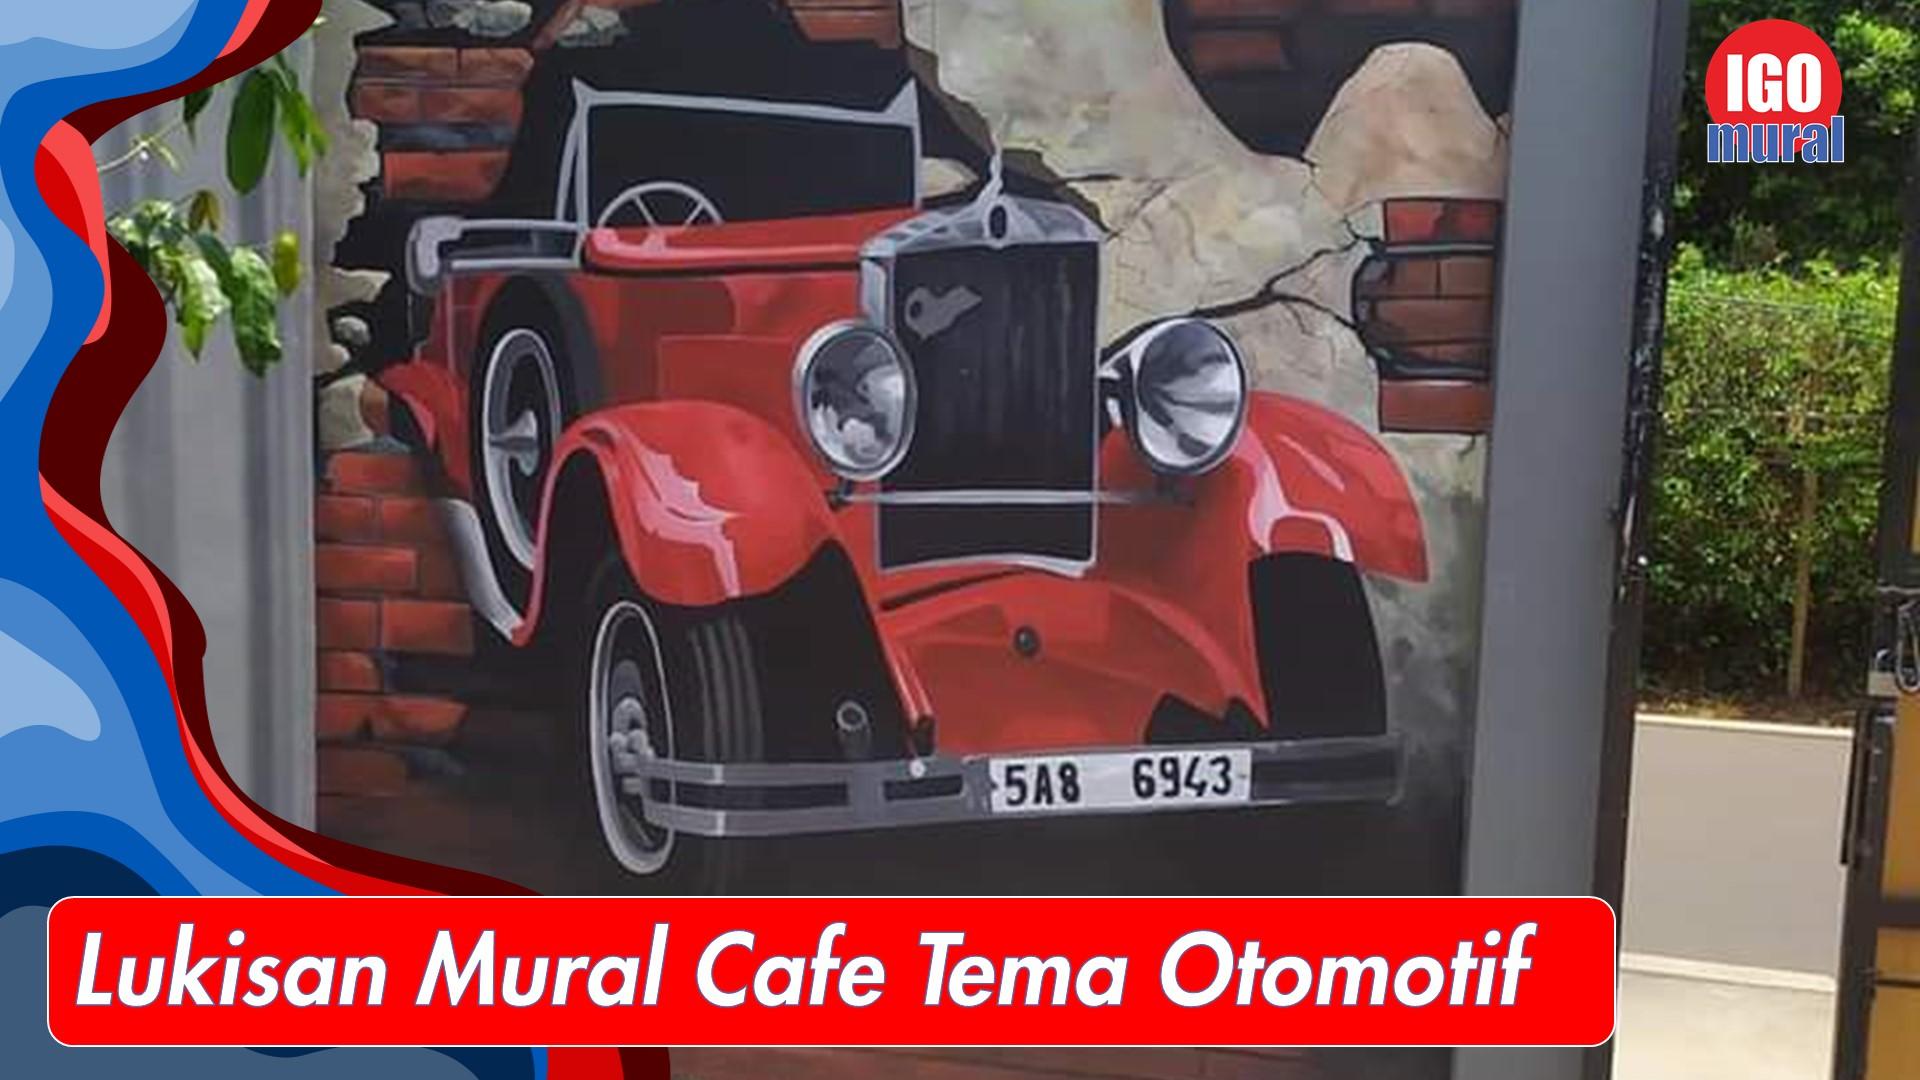 luisan mural cafe tema otomotif